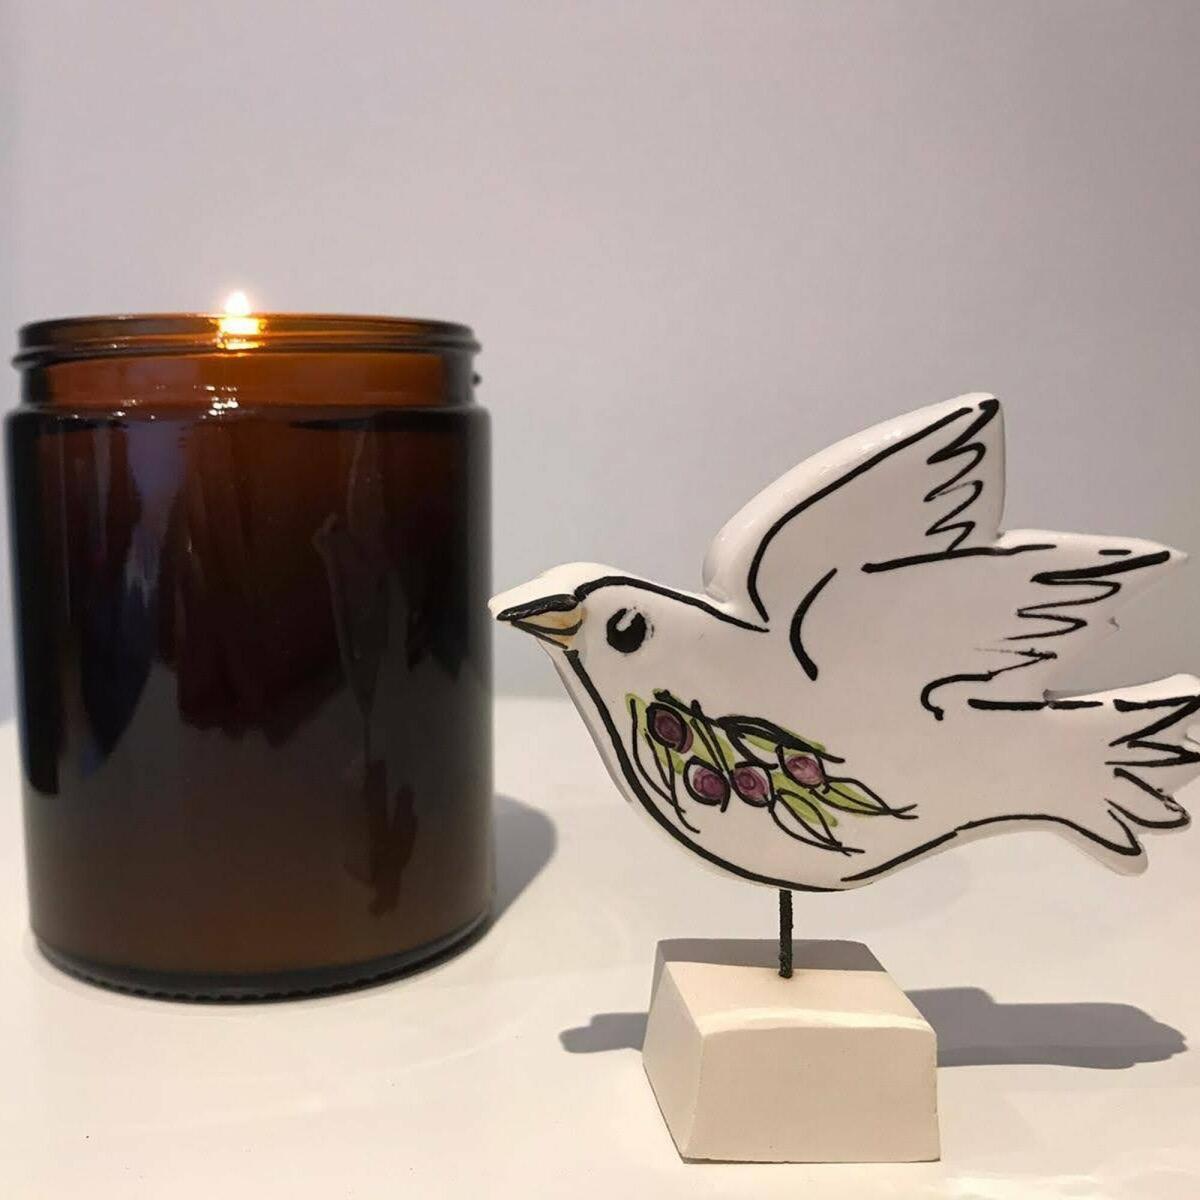 Enjoy the decorative artisan makes